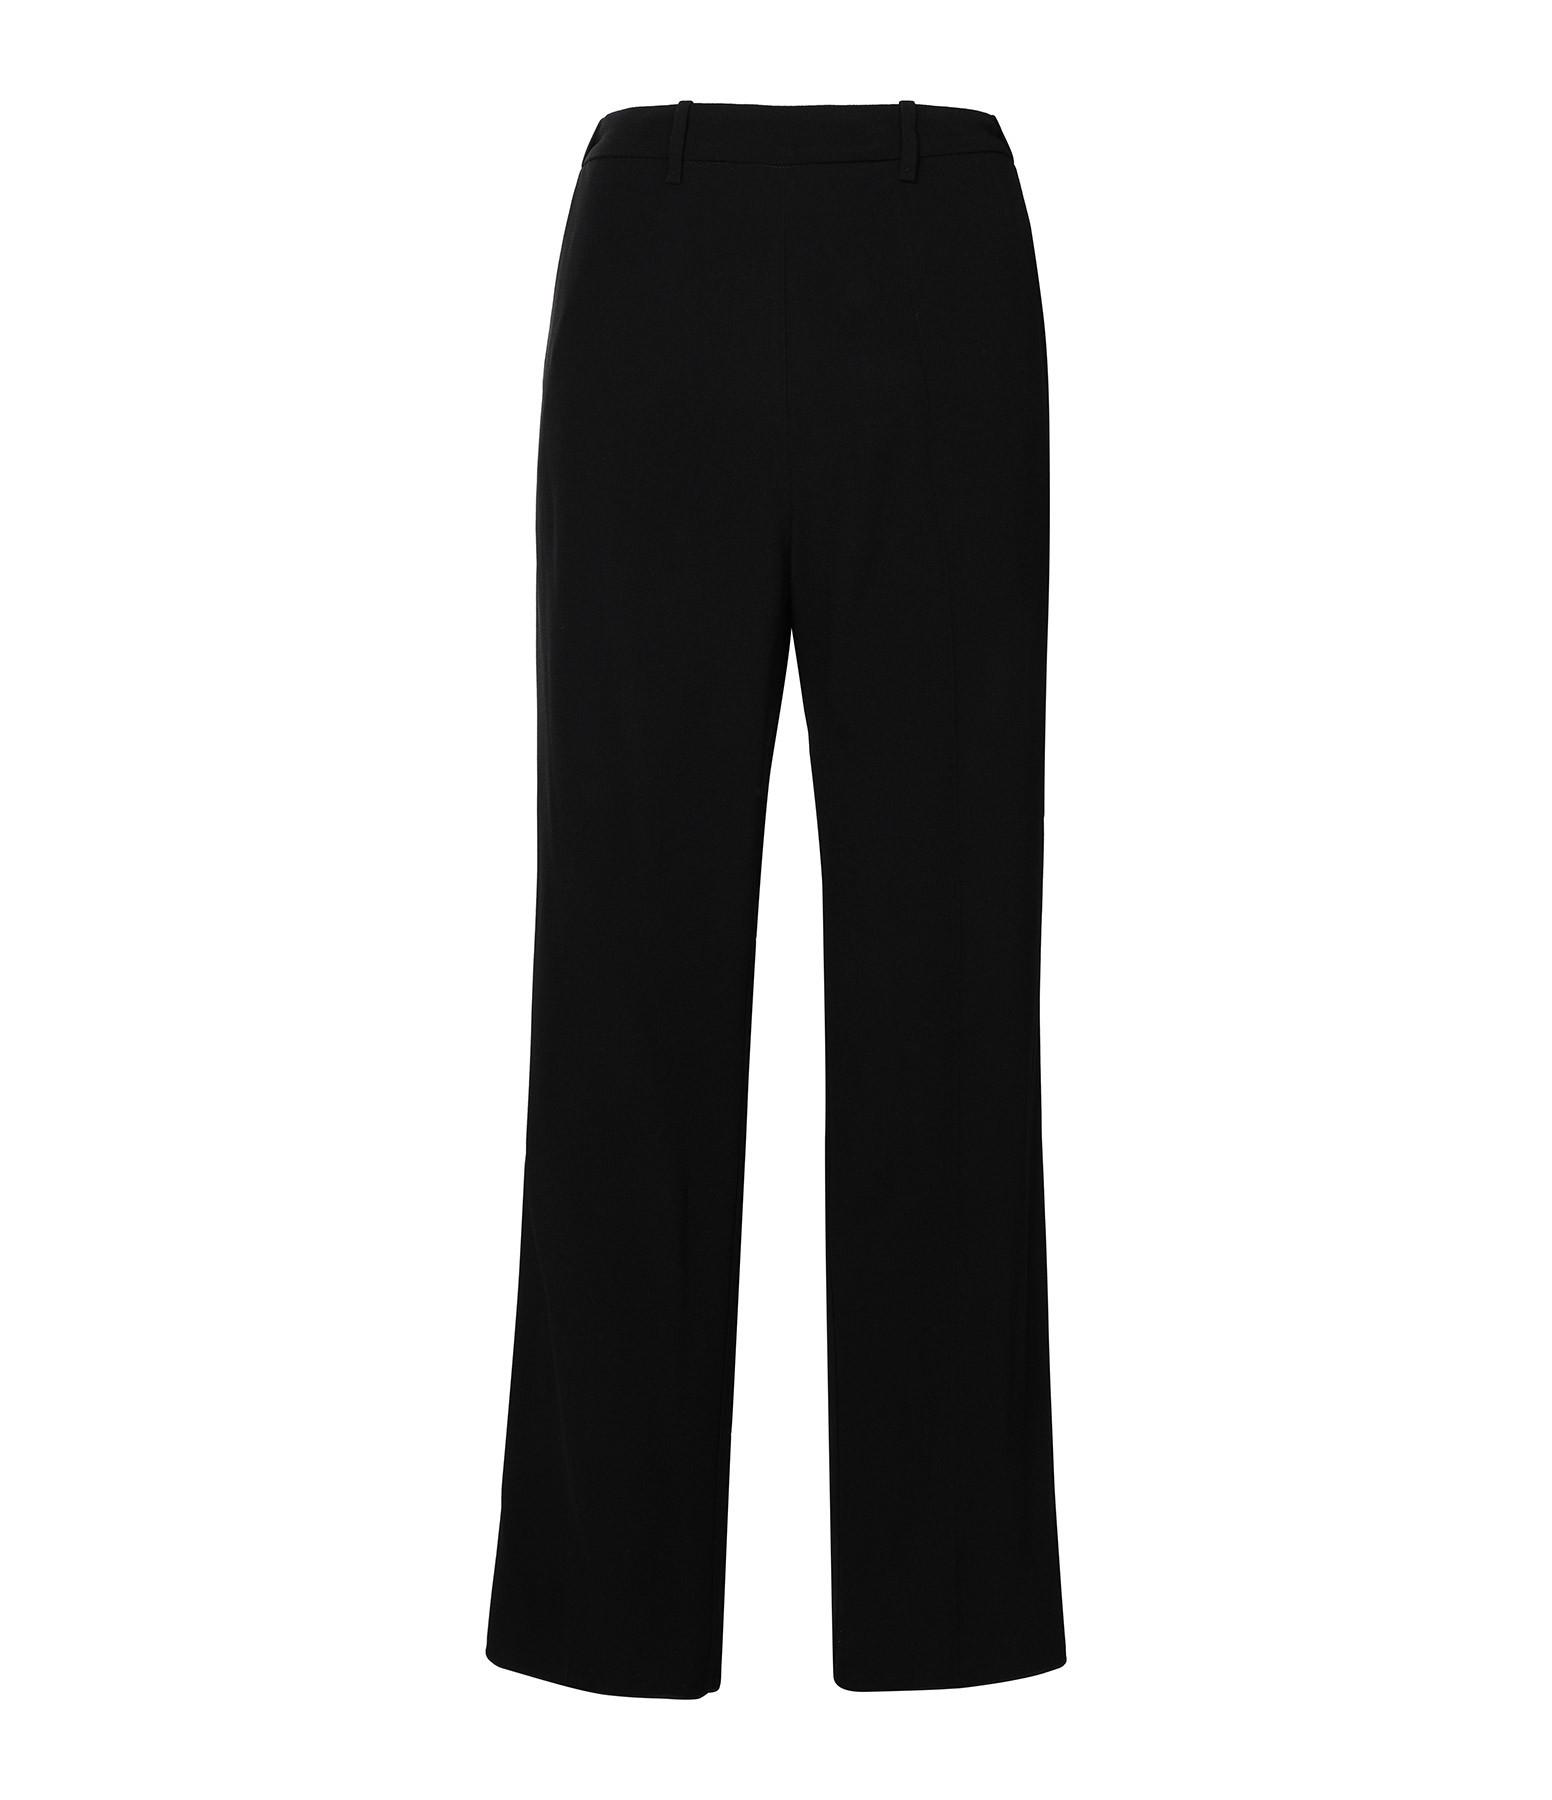 FORTE_FORTE - Pantalon Satin Crêpe Noir